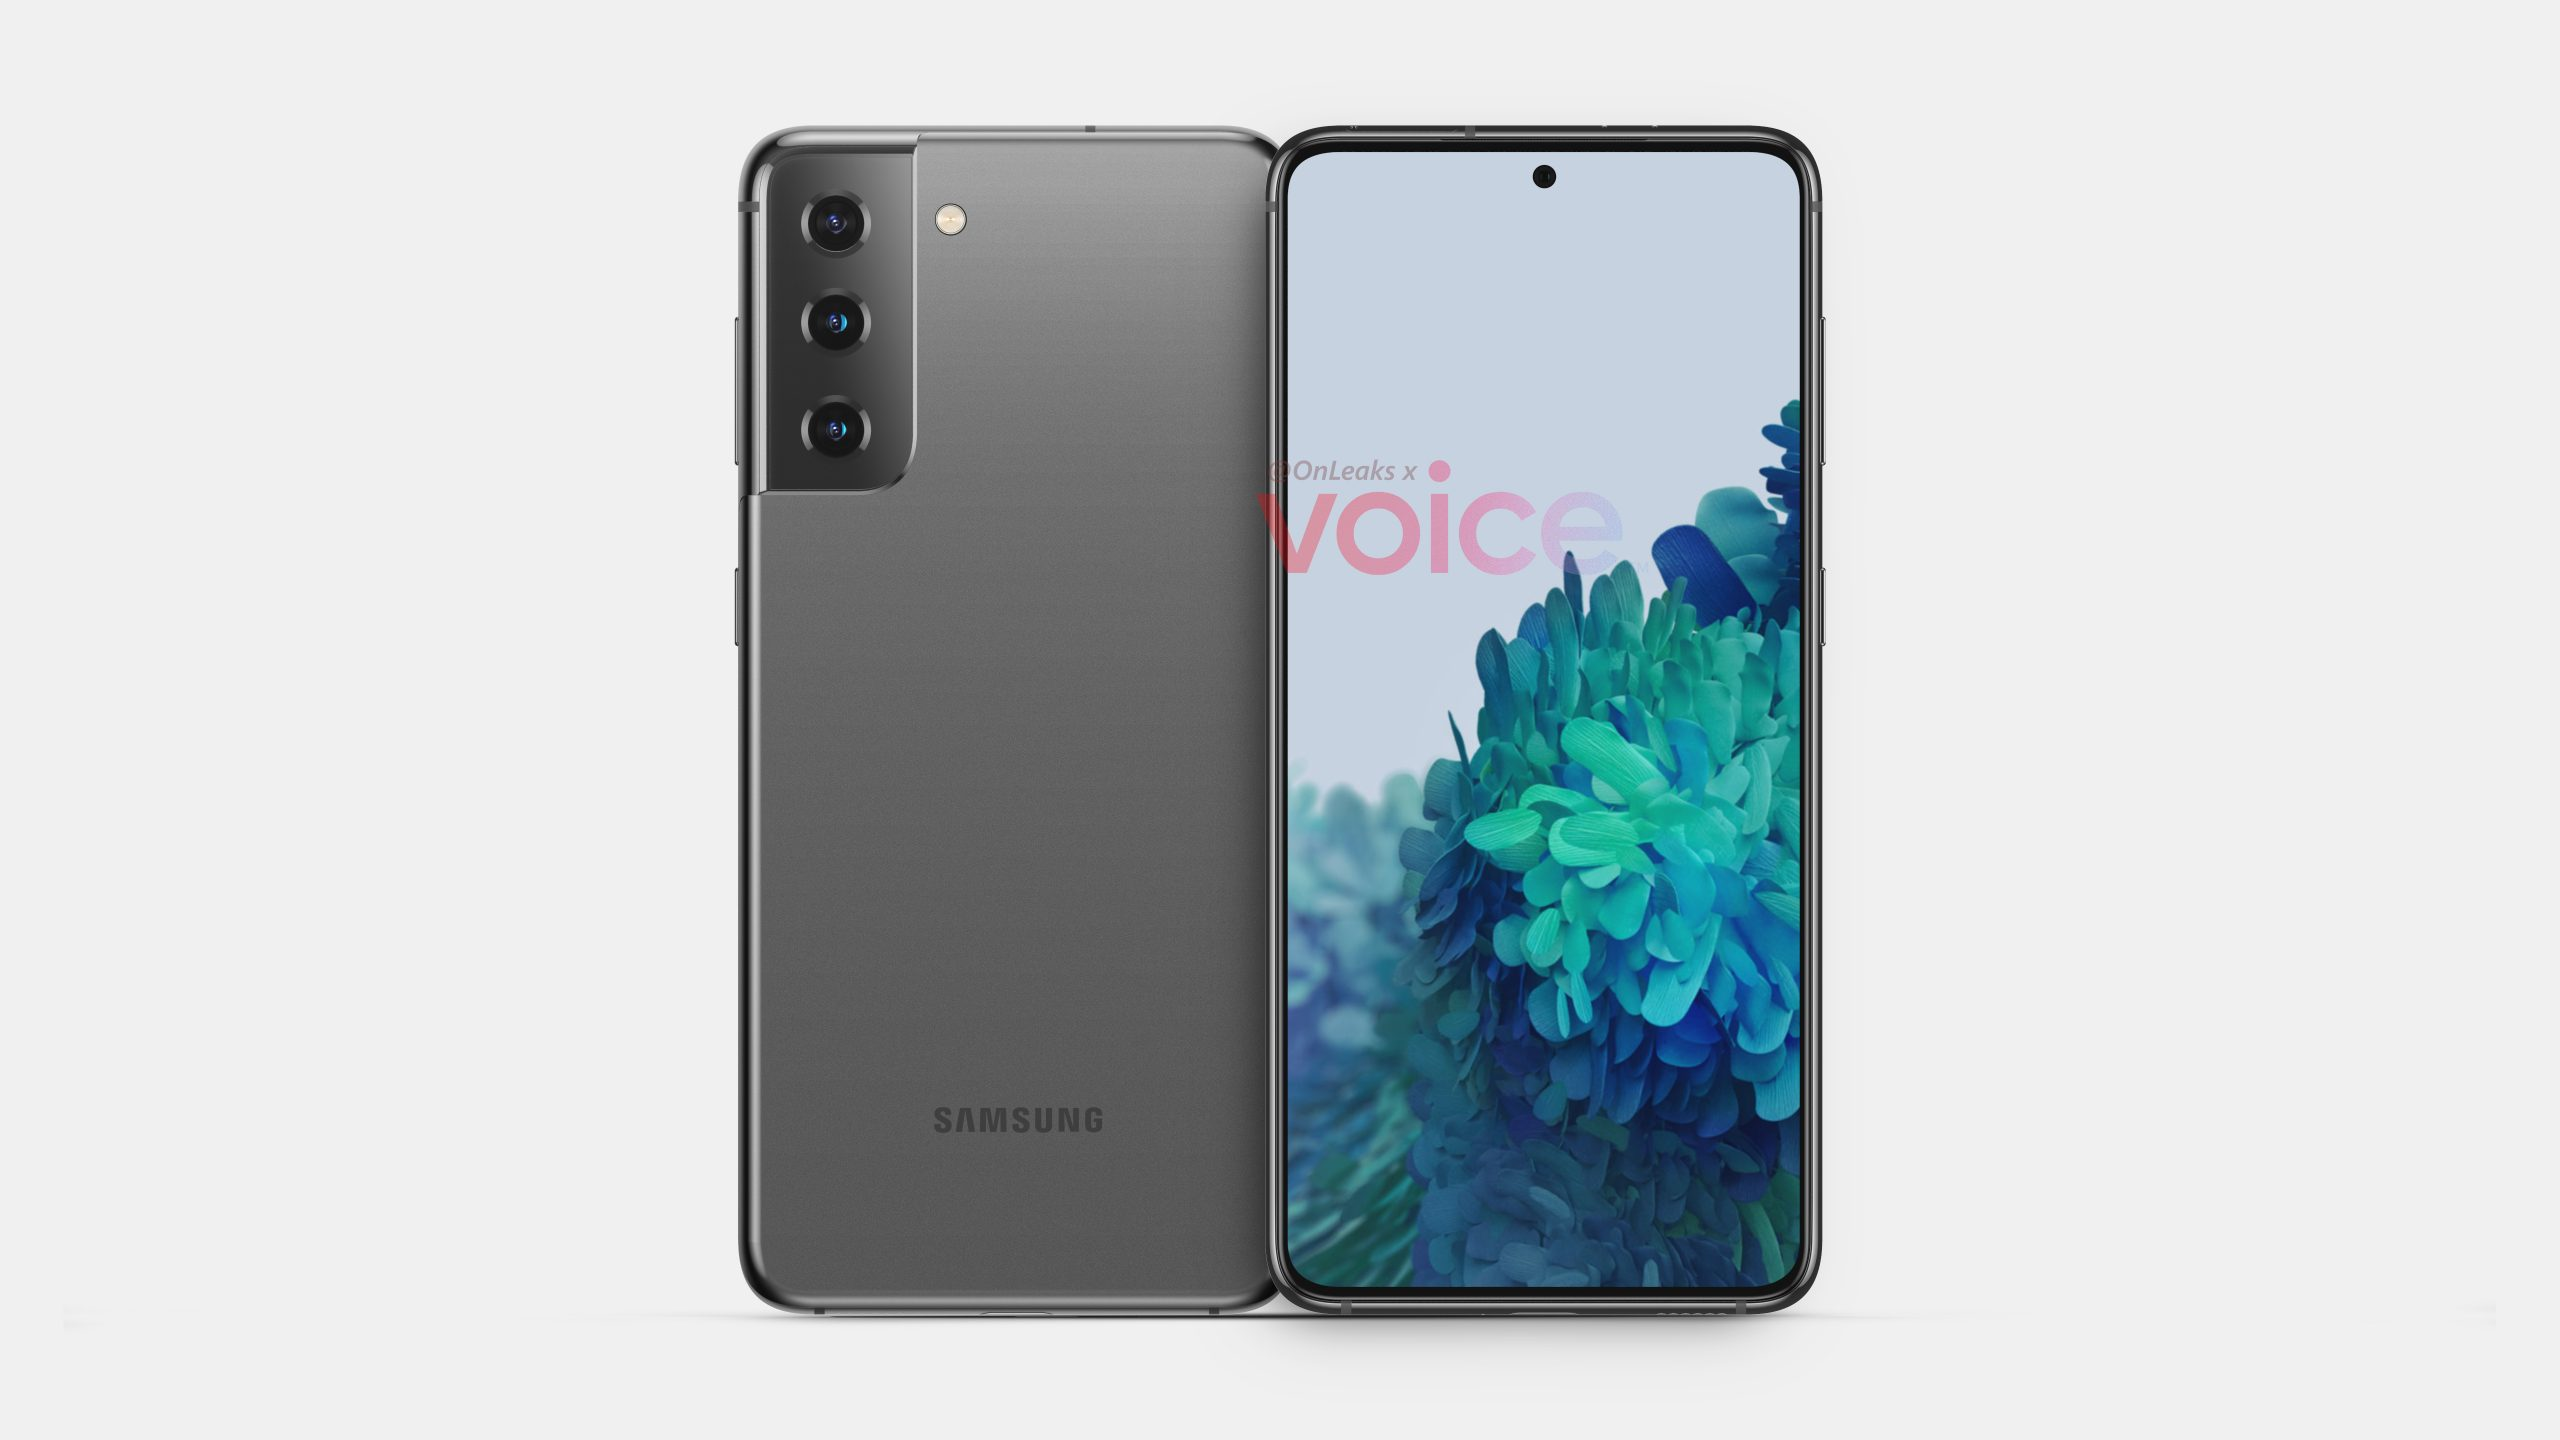 Samsung Galaxy S21 Frontal Y Trasera